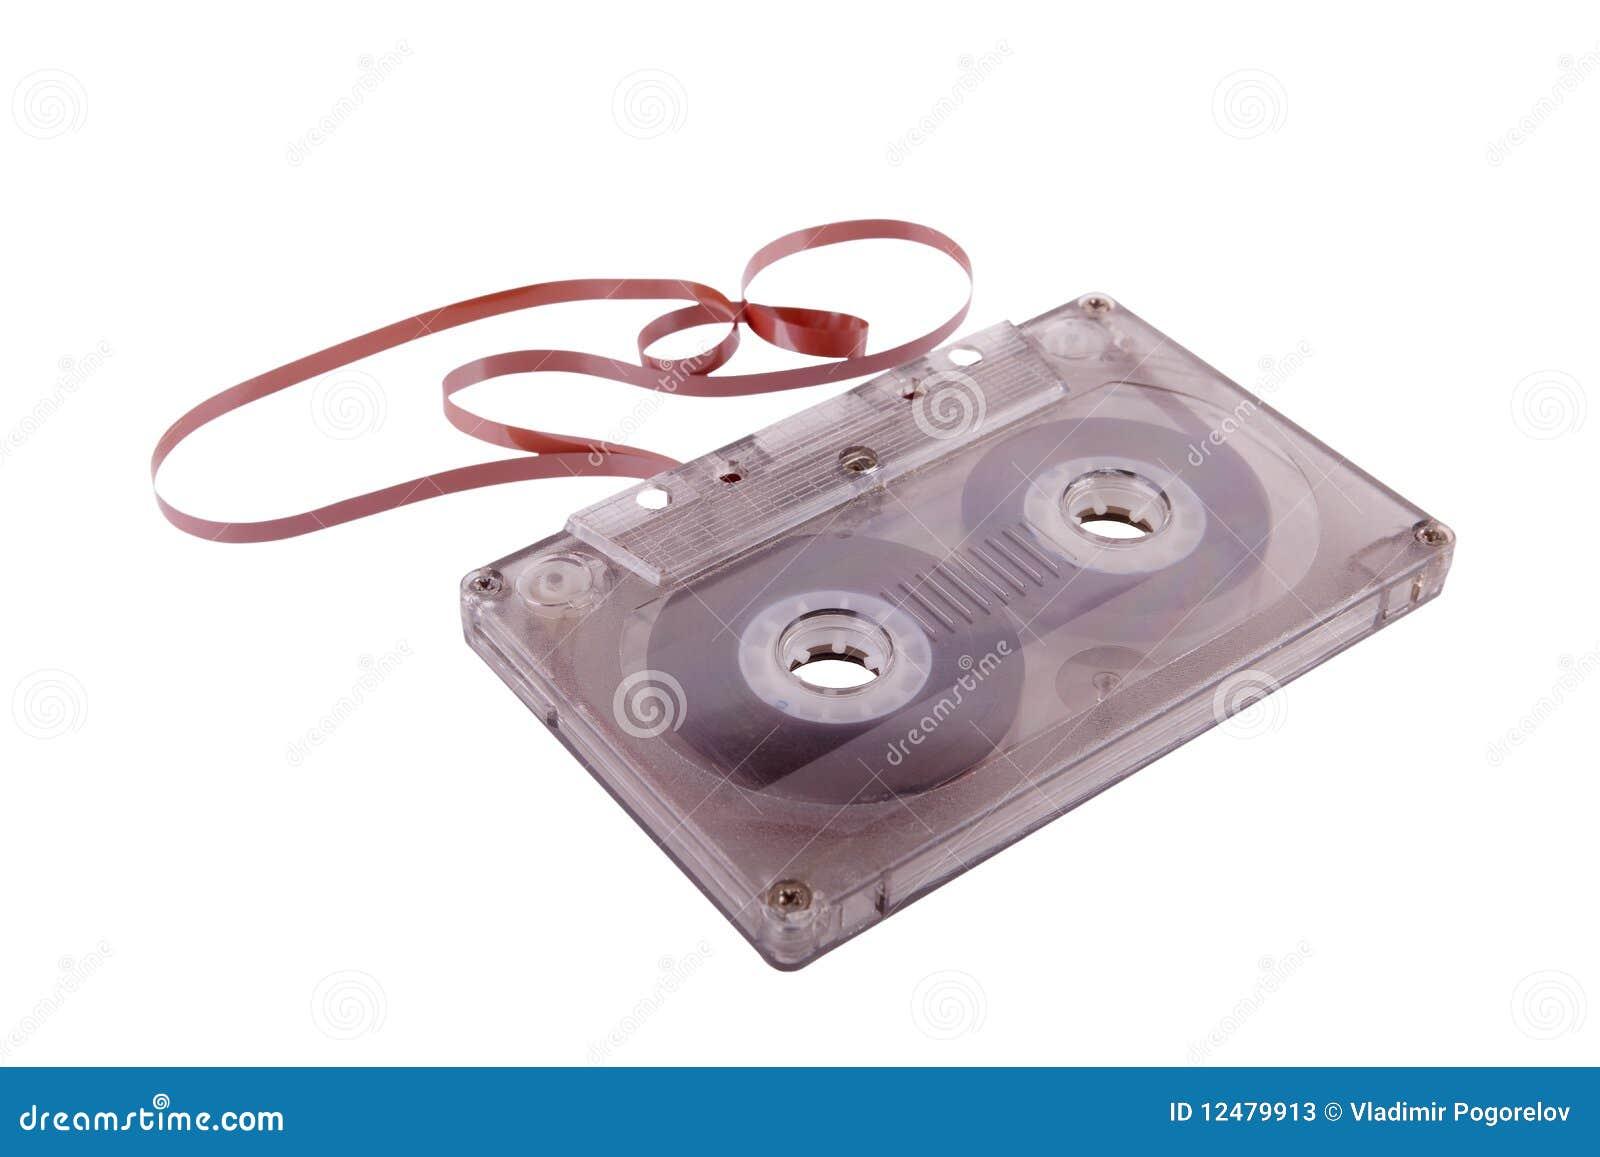 Armazenamento obsoleto da música. Gaveta audio e fita